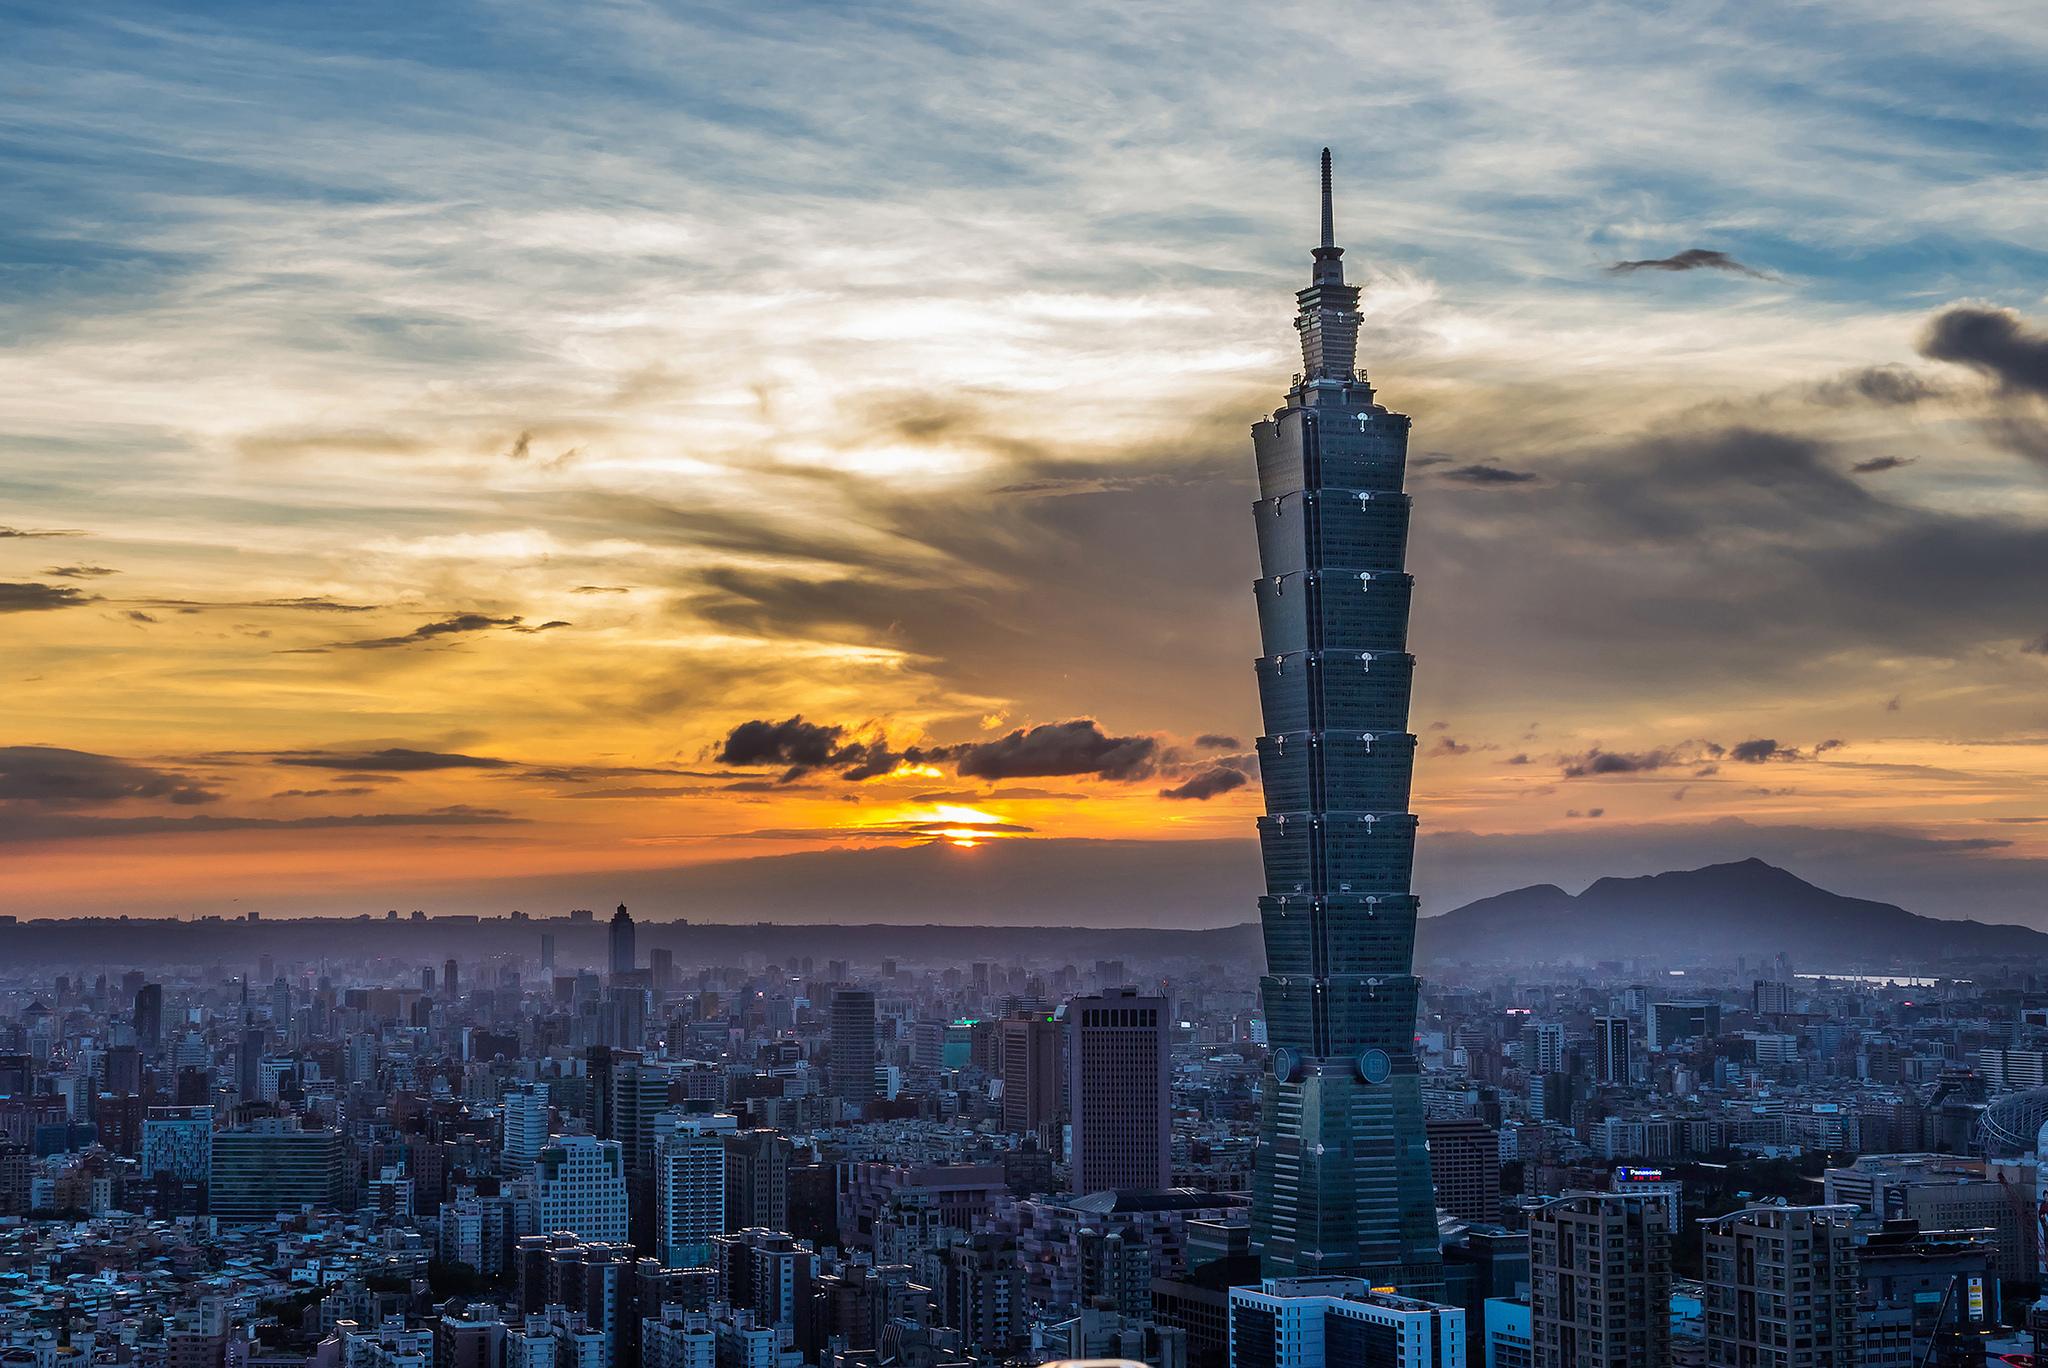 """Taipei 101 During Sunset"" by Tsaiian via Flickr Creative Commons"